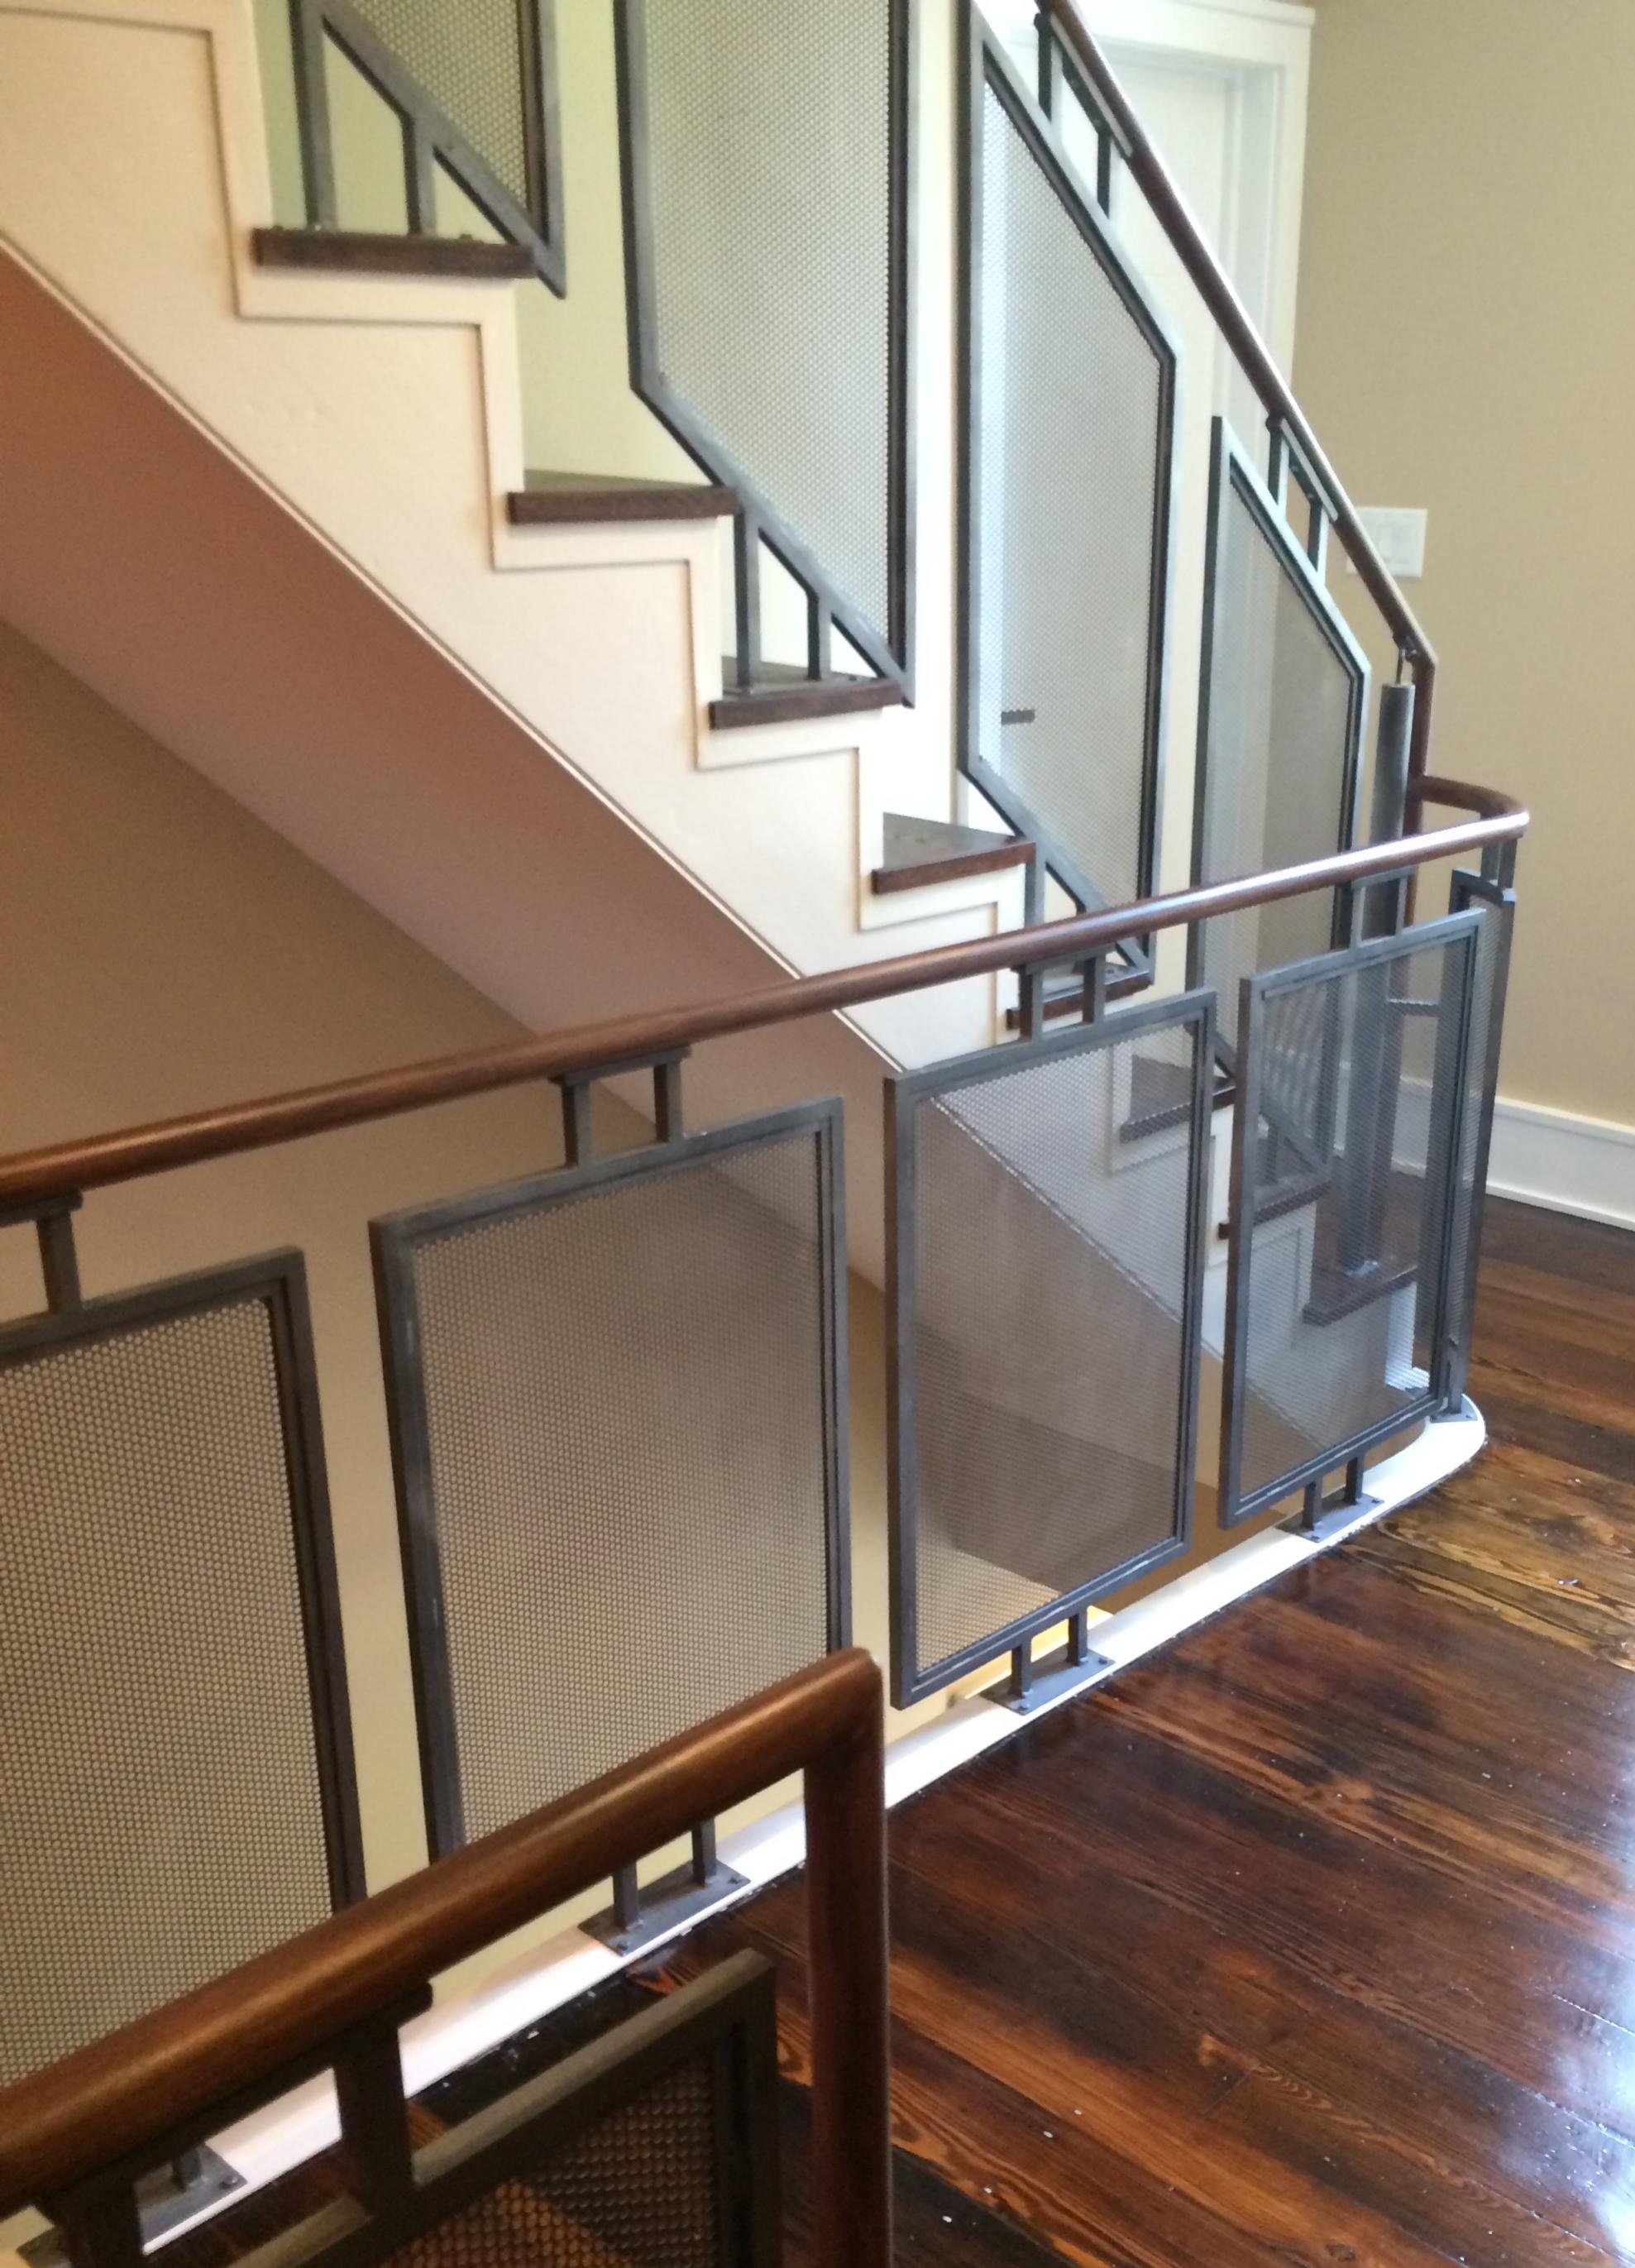 Perforated steel railing